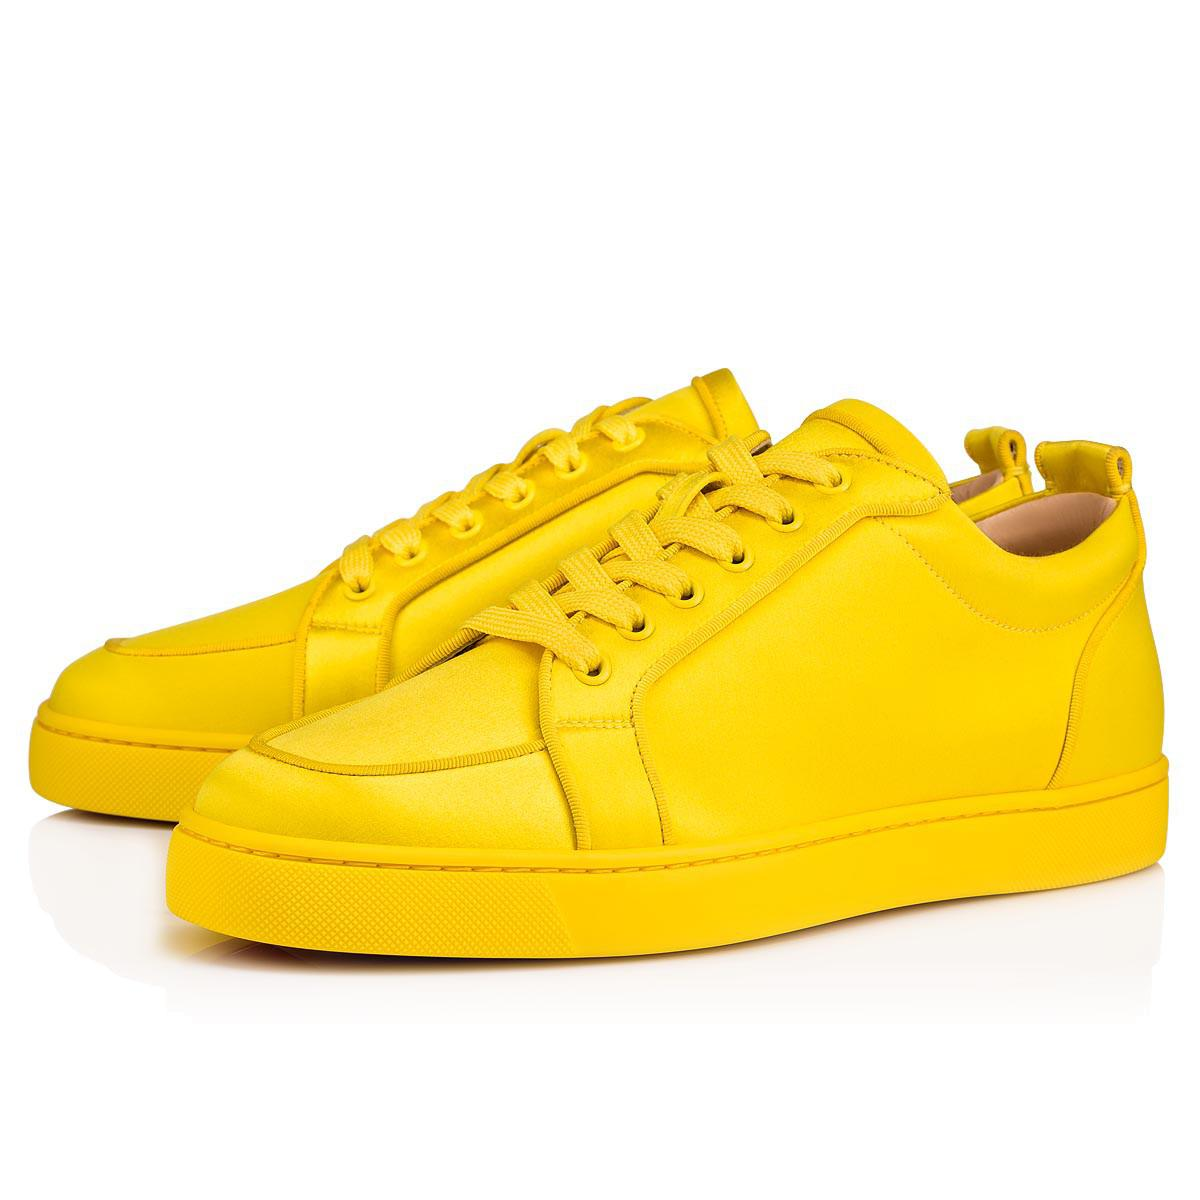 e7ded8e0afc2 Lyst - Christian Louboutin Rantulow Orlato Men s Flat in Yellow for Men